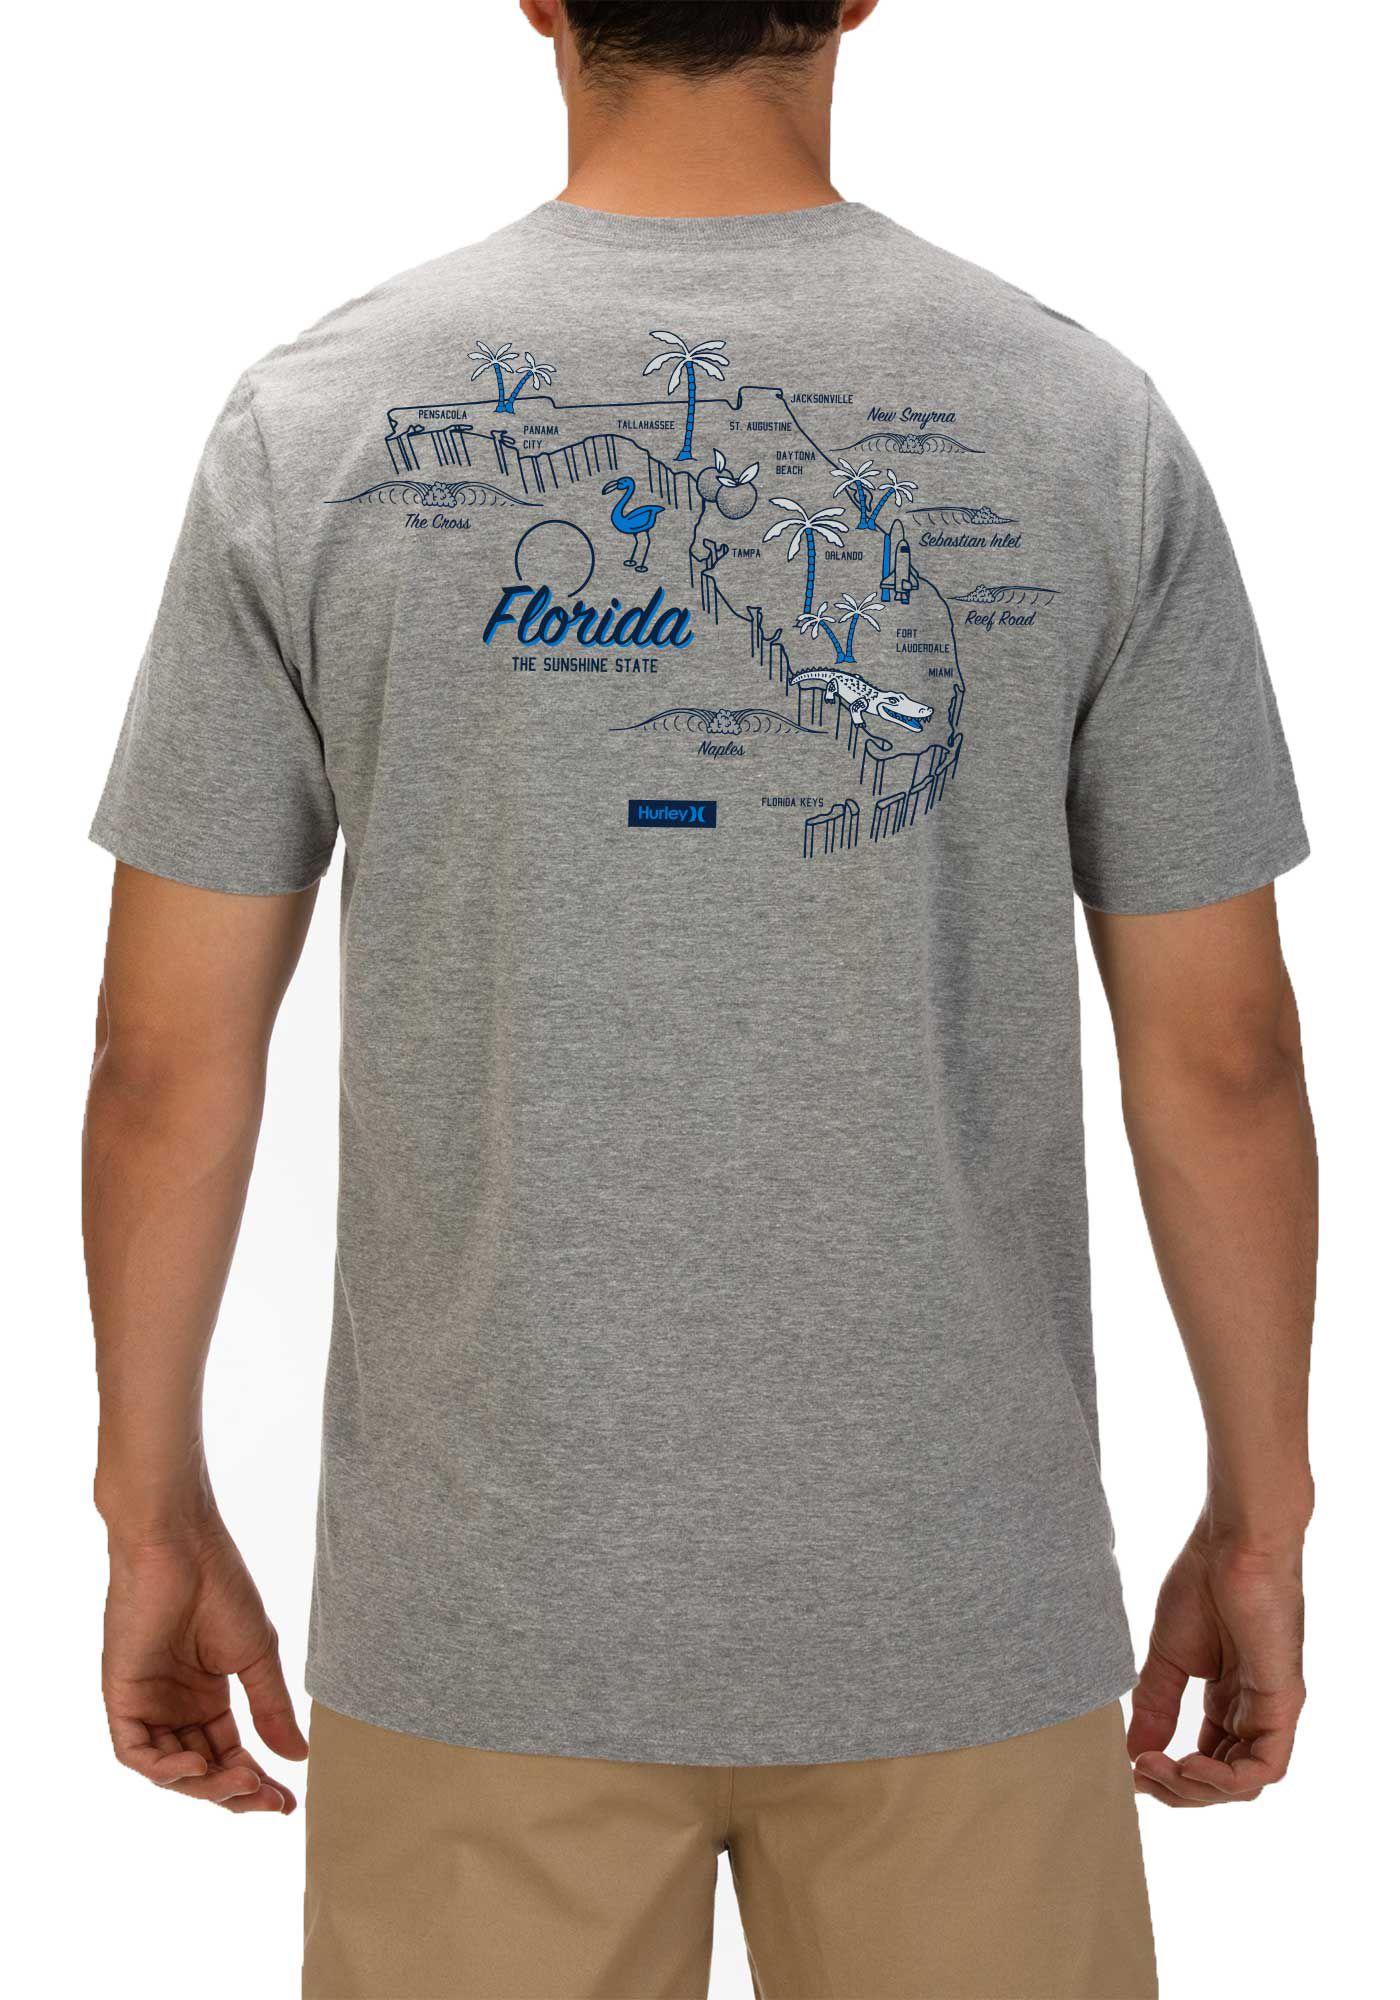 Hurley Men's Florida 3D Mapstee T-Shirt